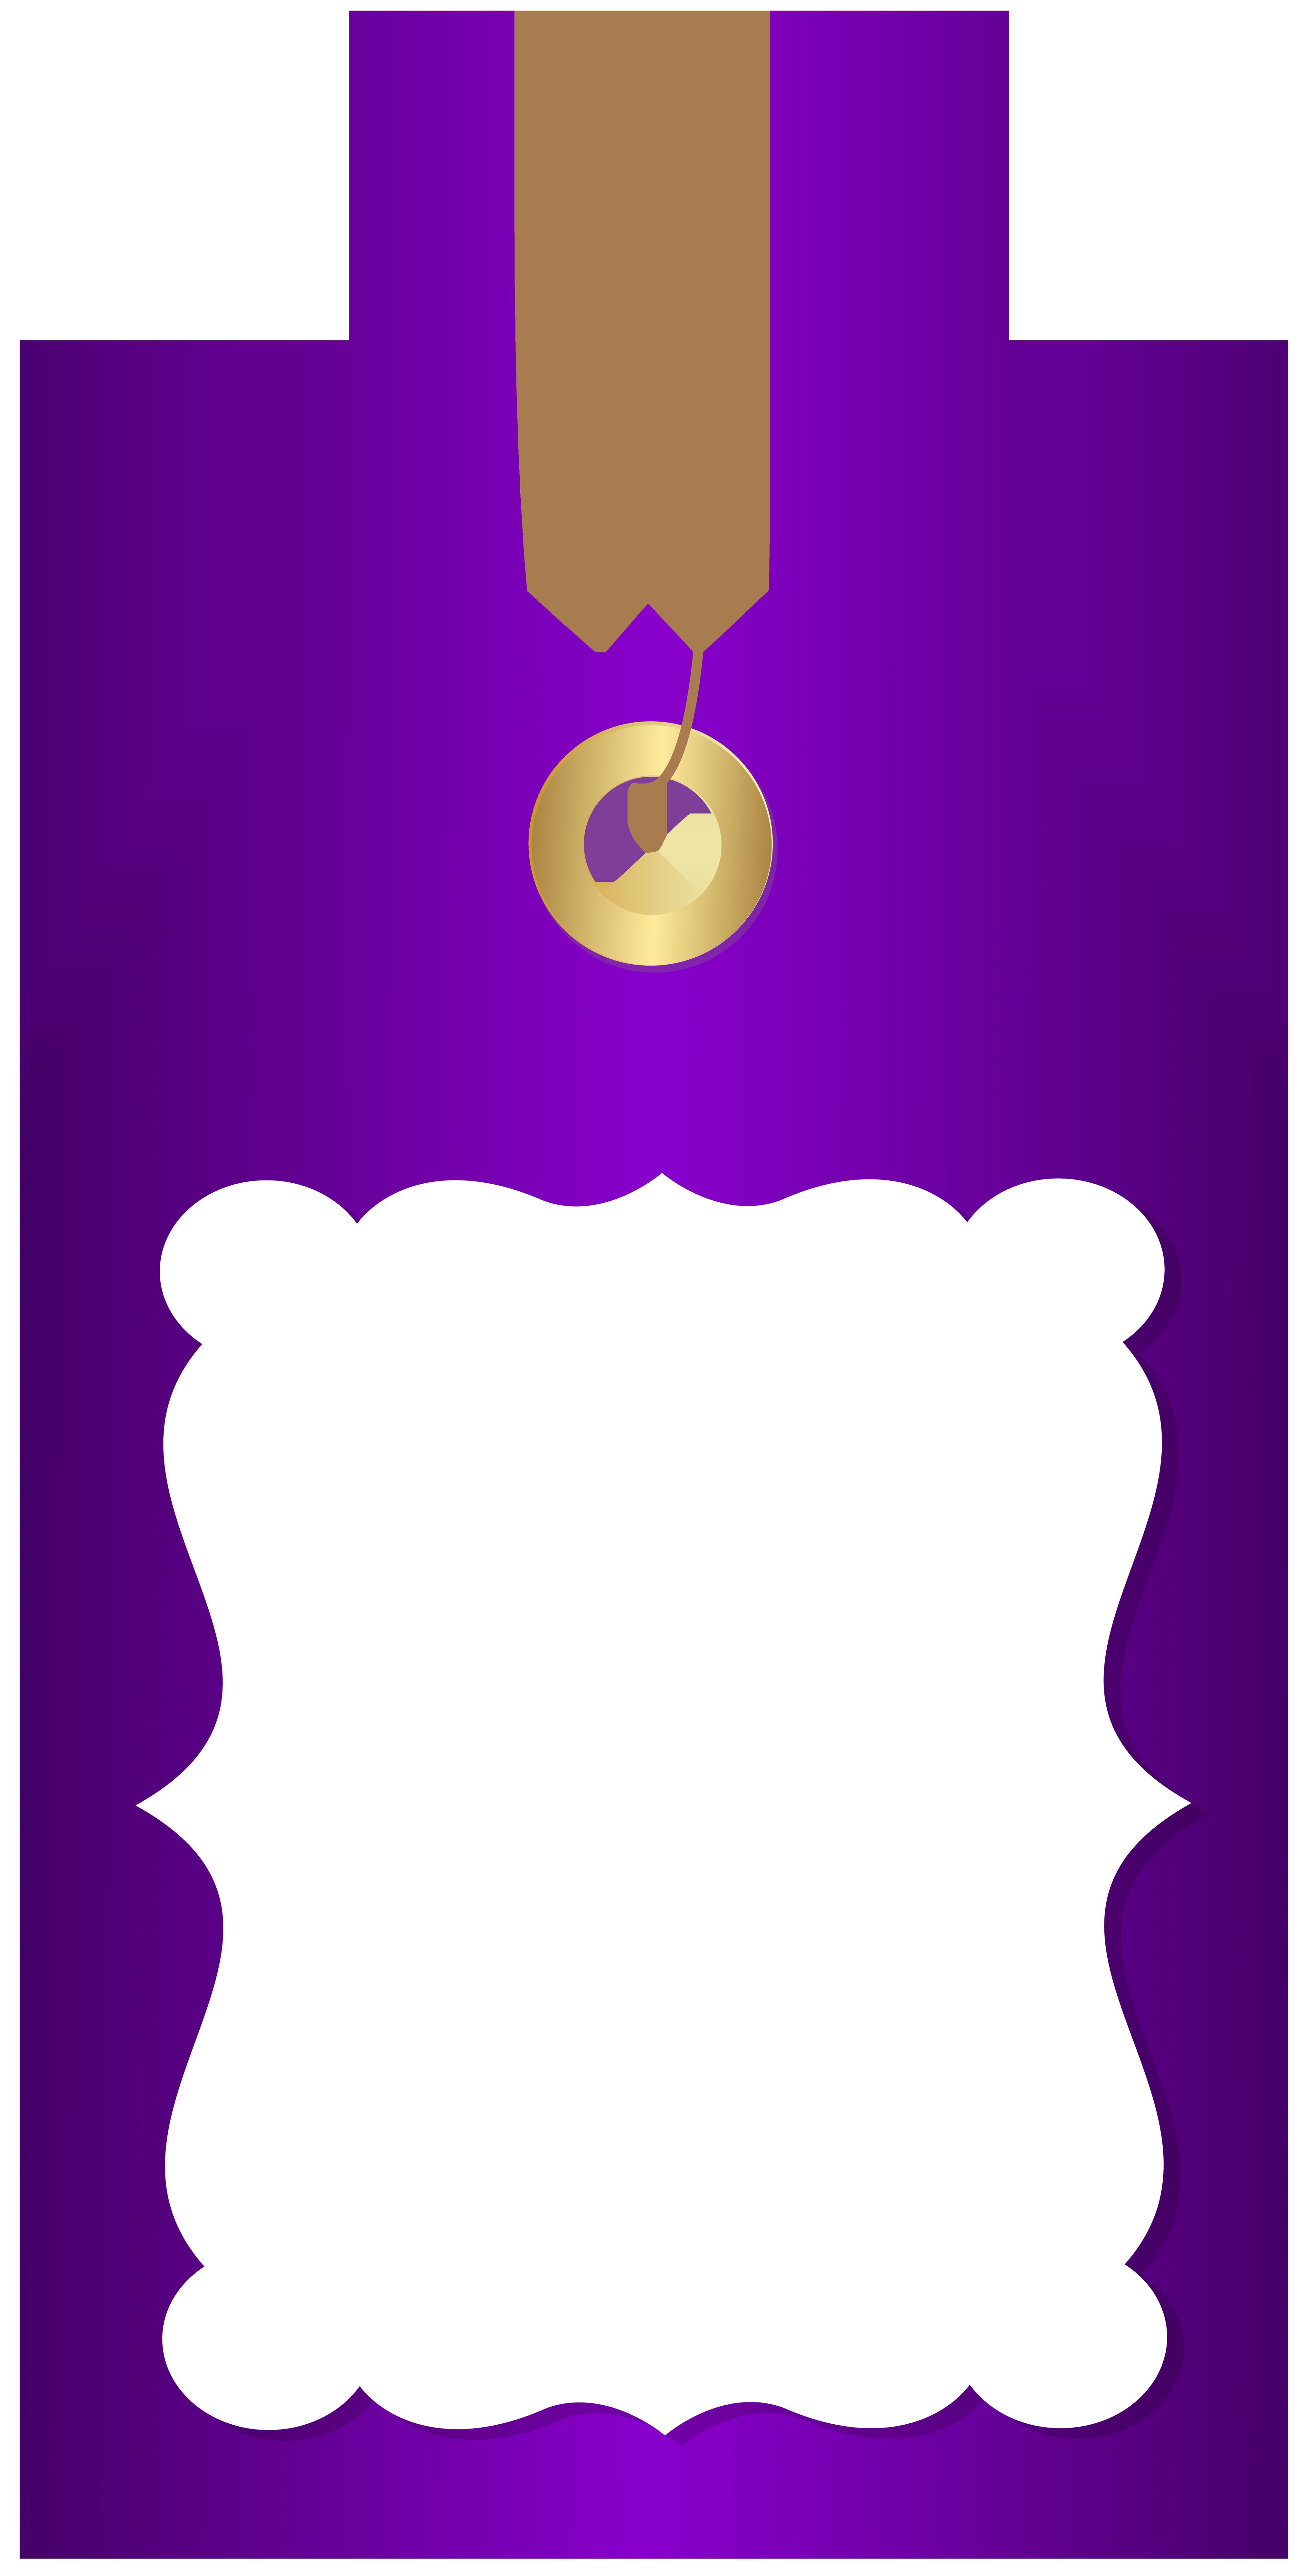 4053x8000 Purple Deco Price Tag Png Clip Art Imageu200b Gallery Yopriceville